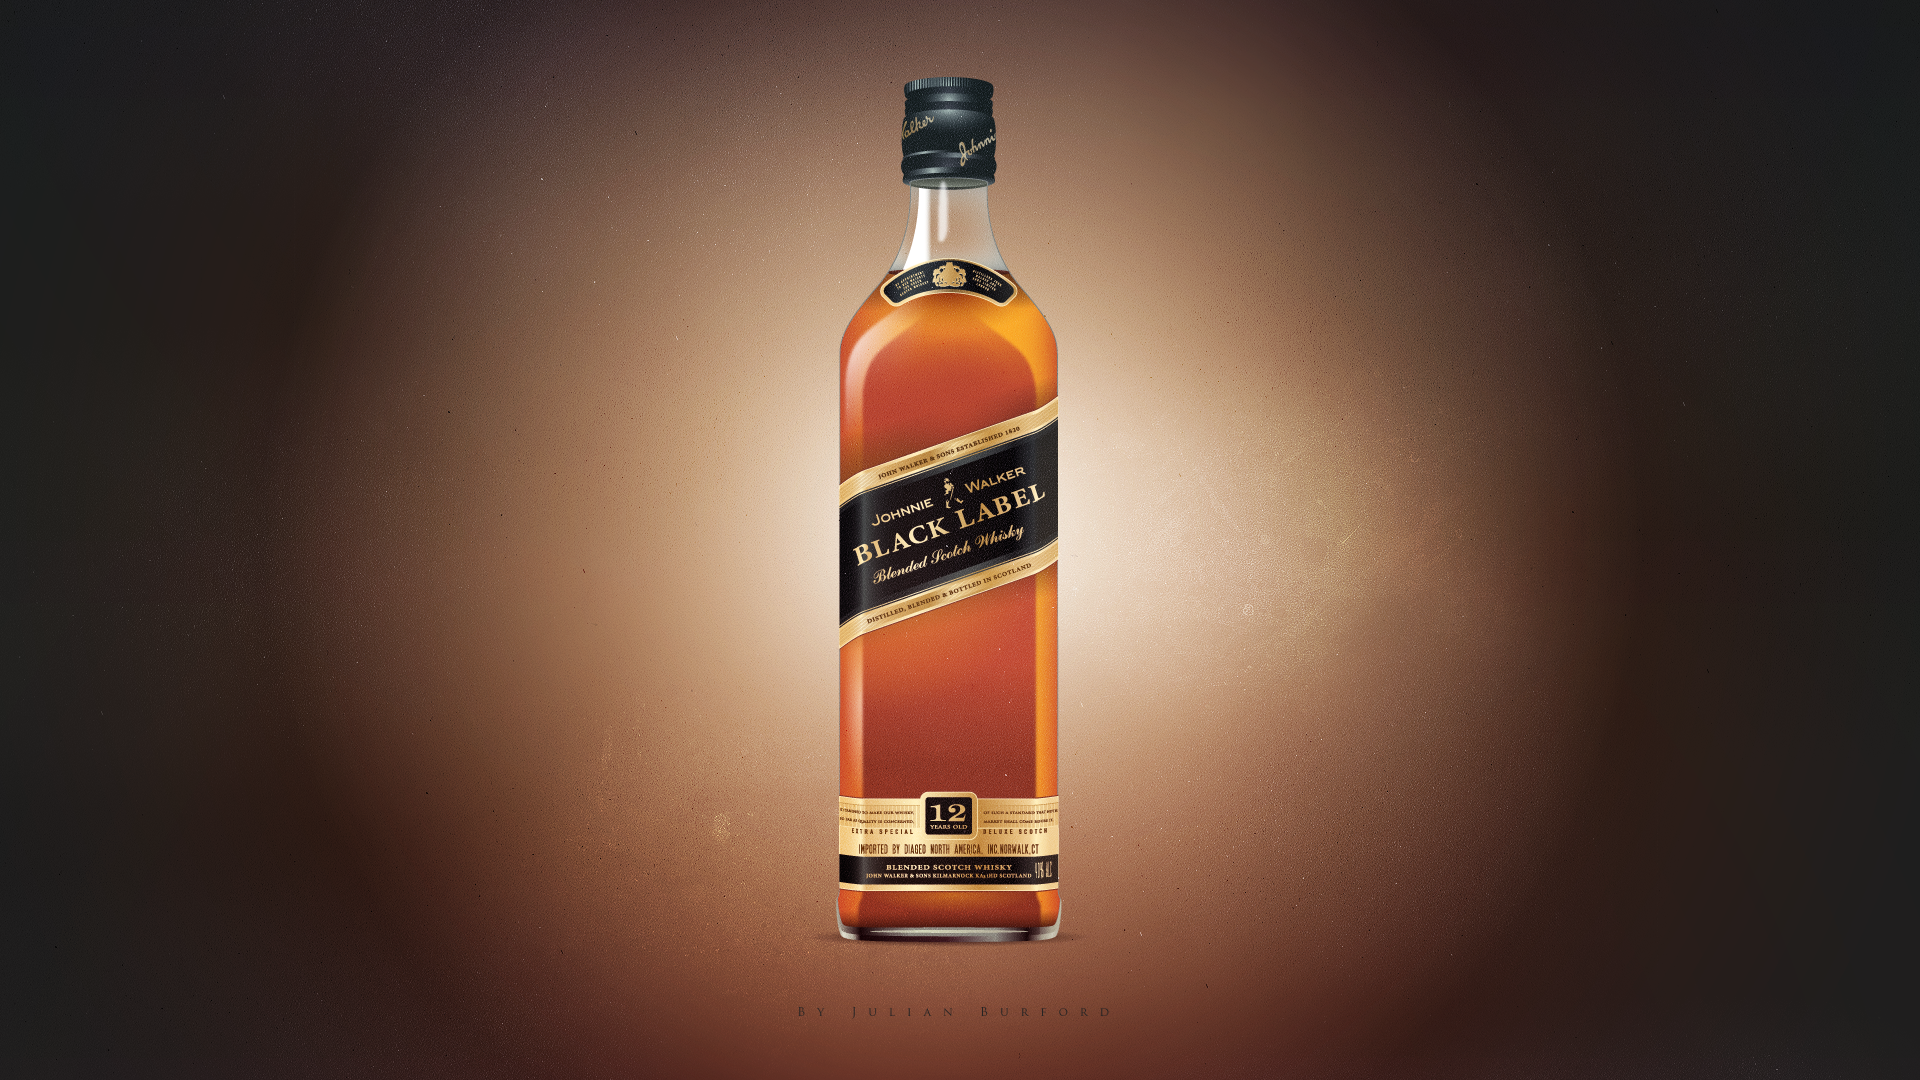 Whiskey Wallpaper - WallpaperSafari